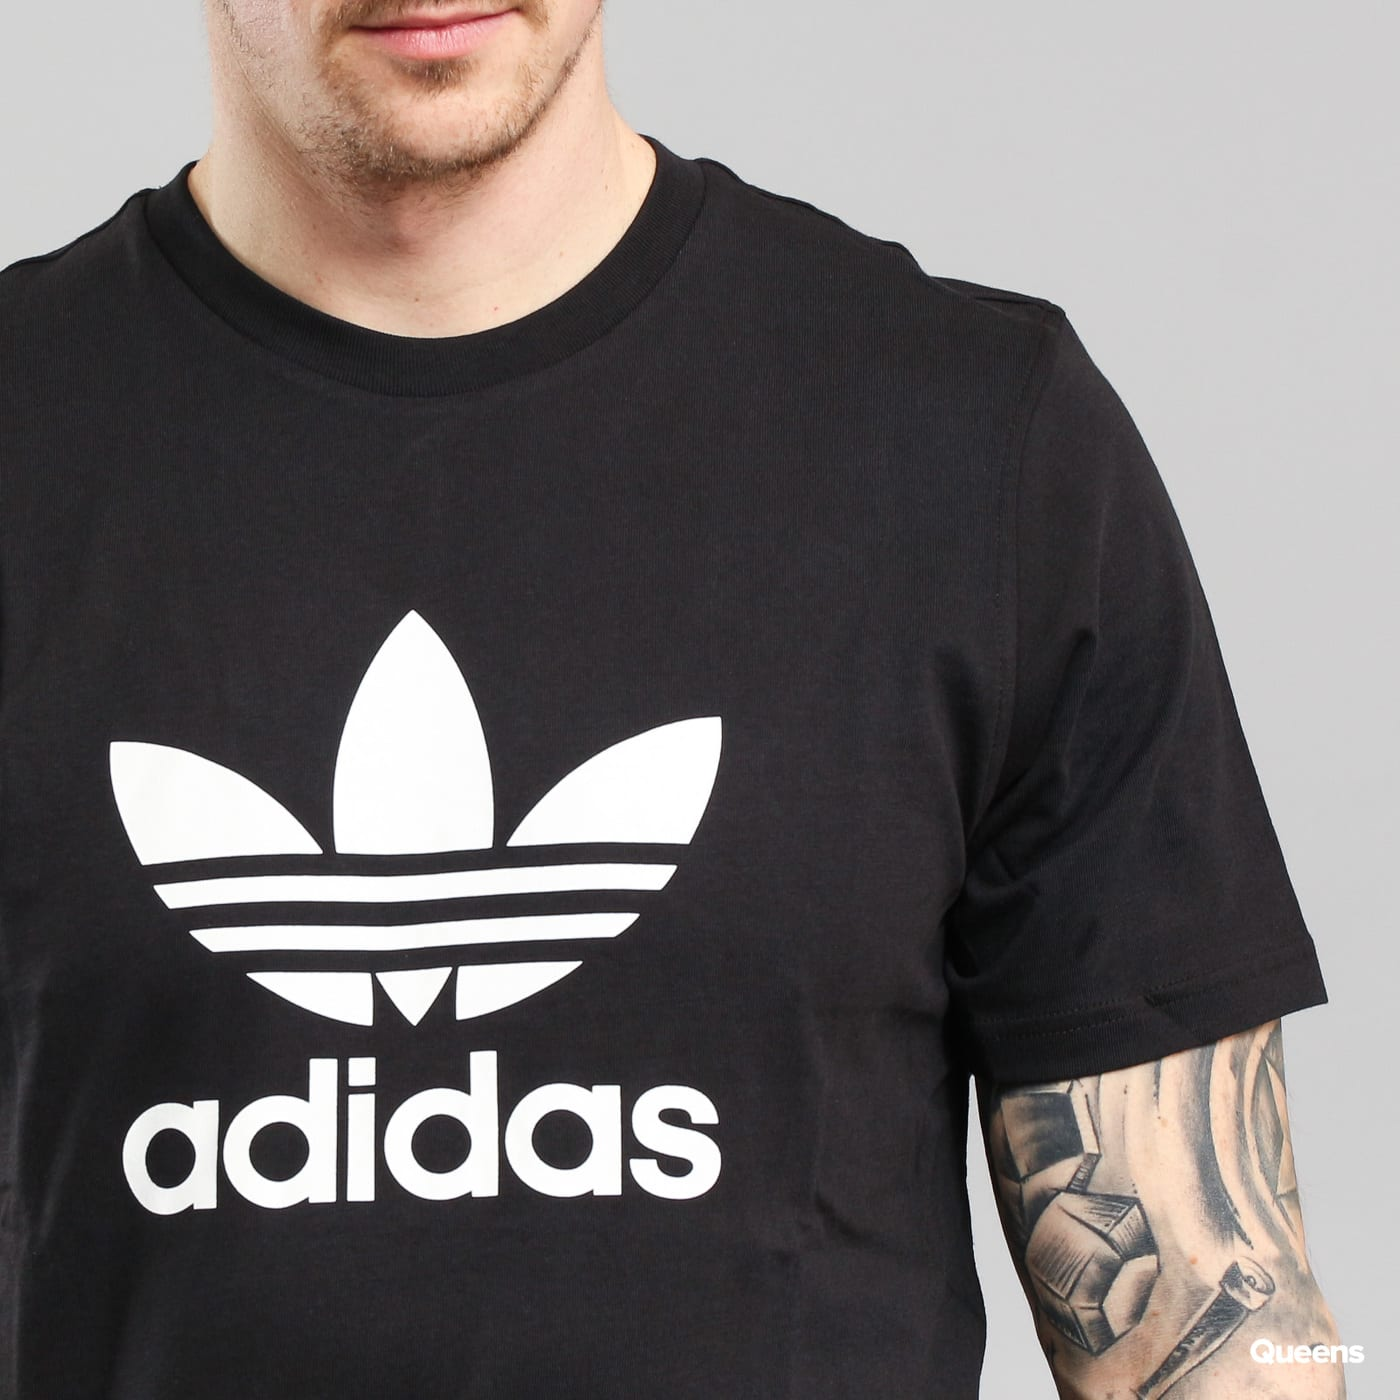 adidas Trefoil T-shirt black